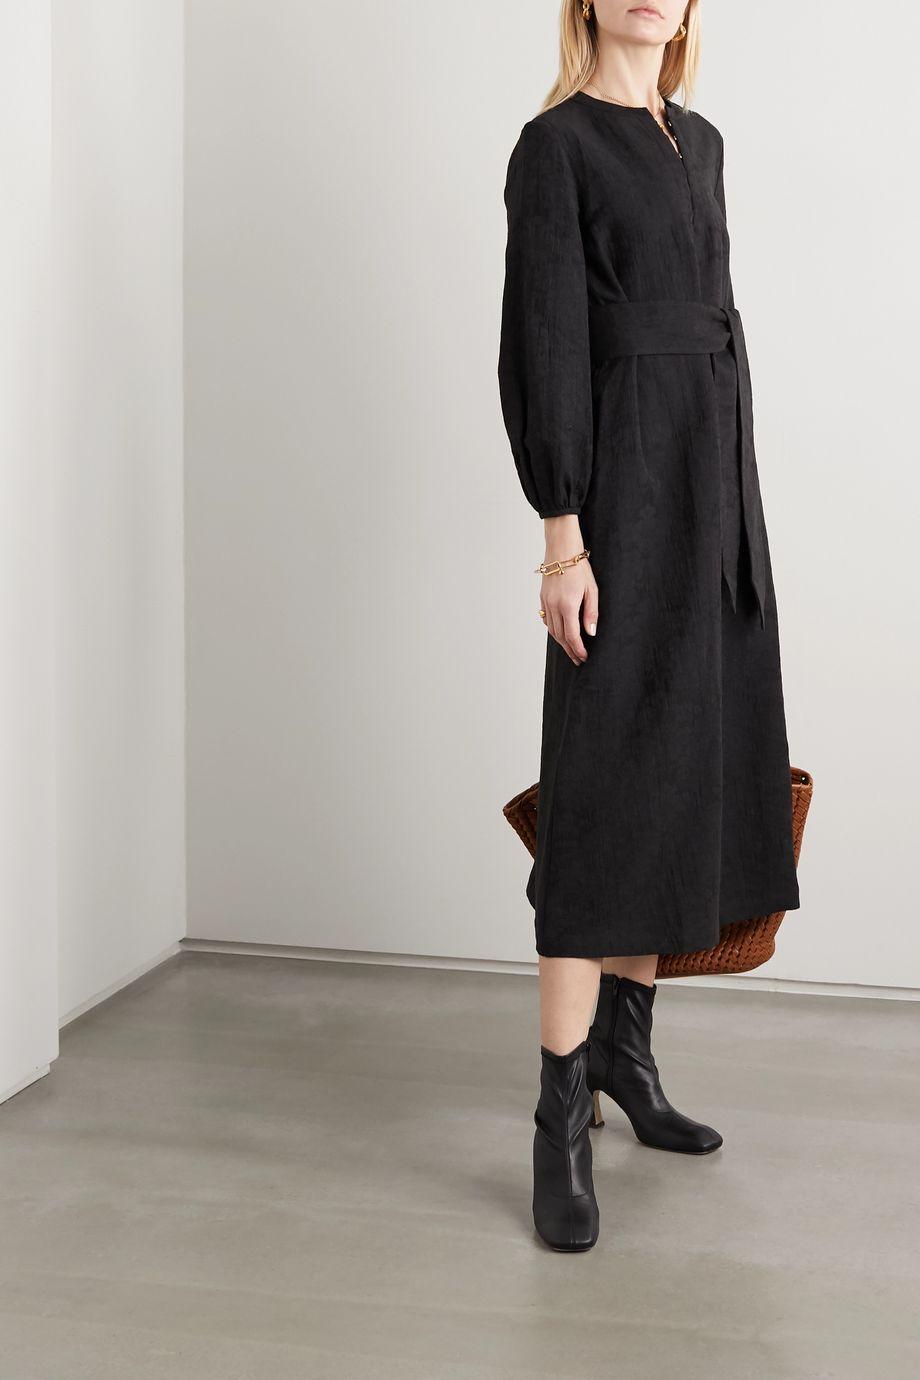 Mara Hoffman + NET SUSTAIN June organic cotton and linen-blend midi dress